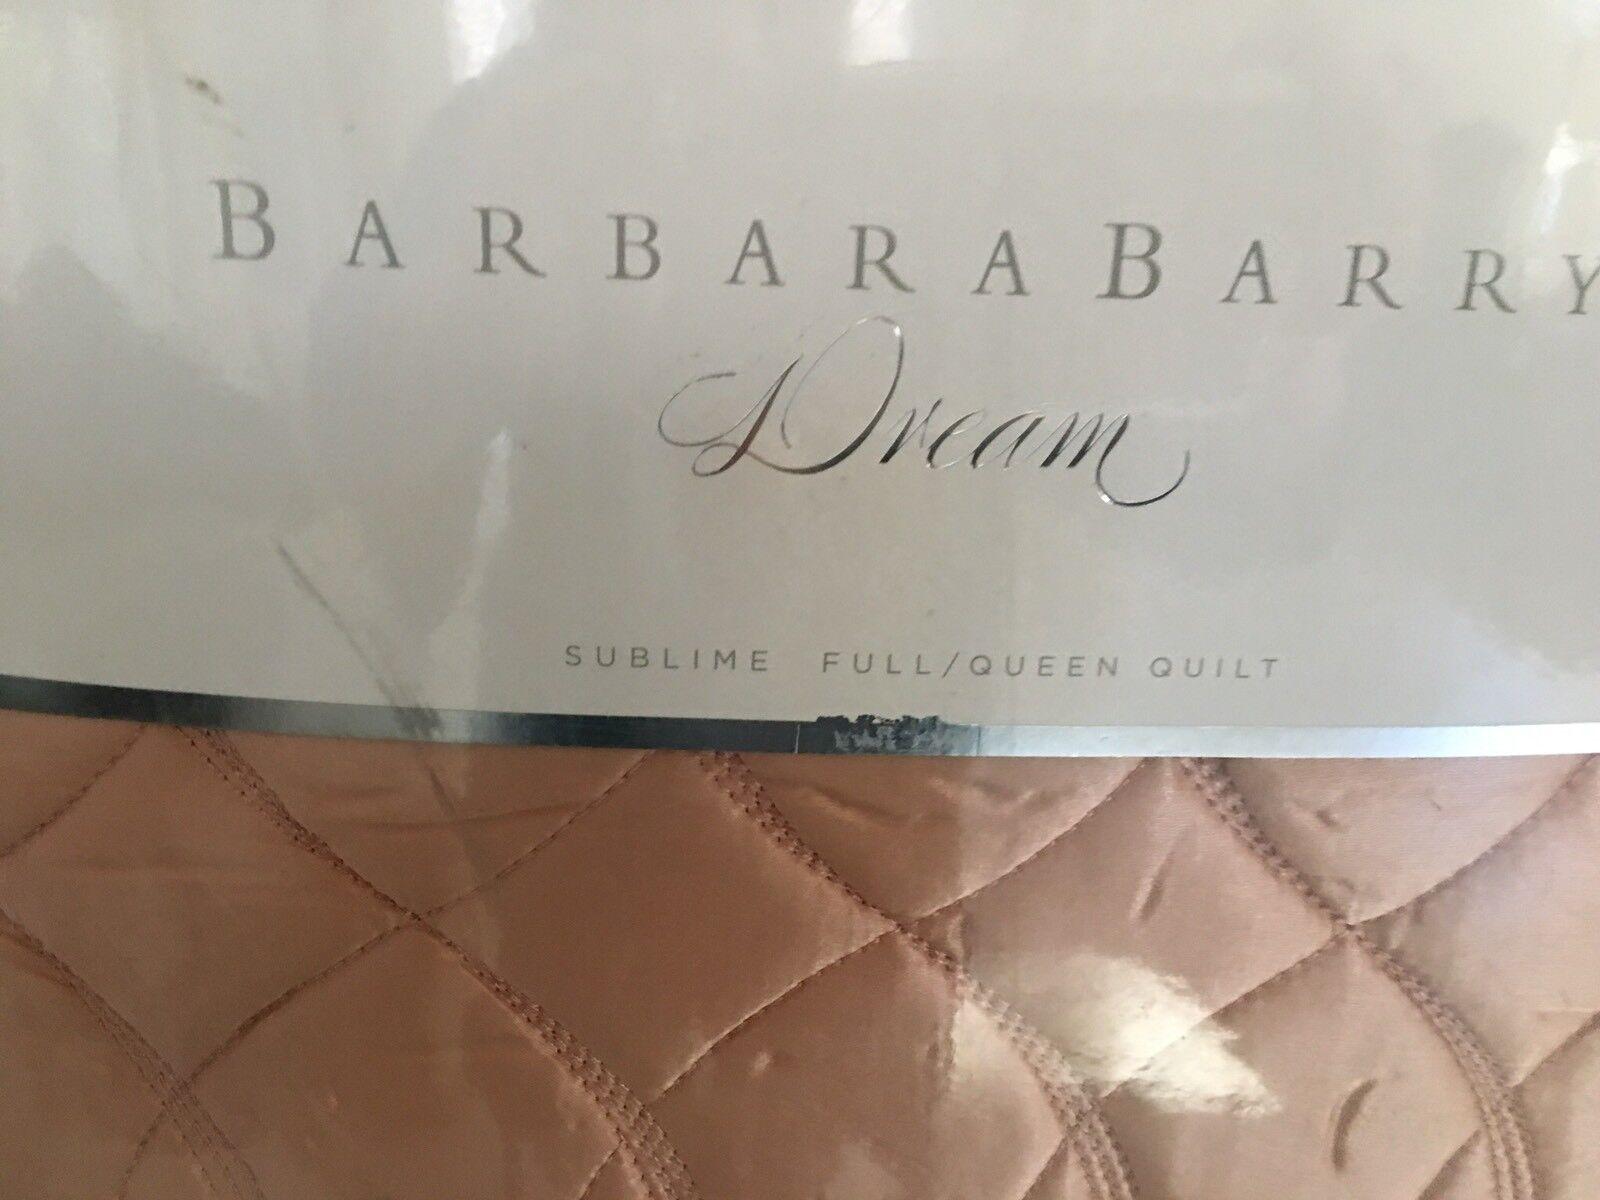 BARBARA BARRY DREAM  SUBLIME  POSY 1 QUEEN QUILT SILK COTTON BLD NIB  400 LAST1